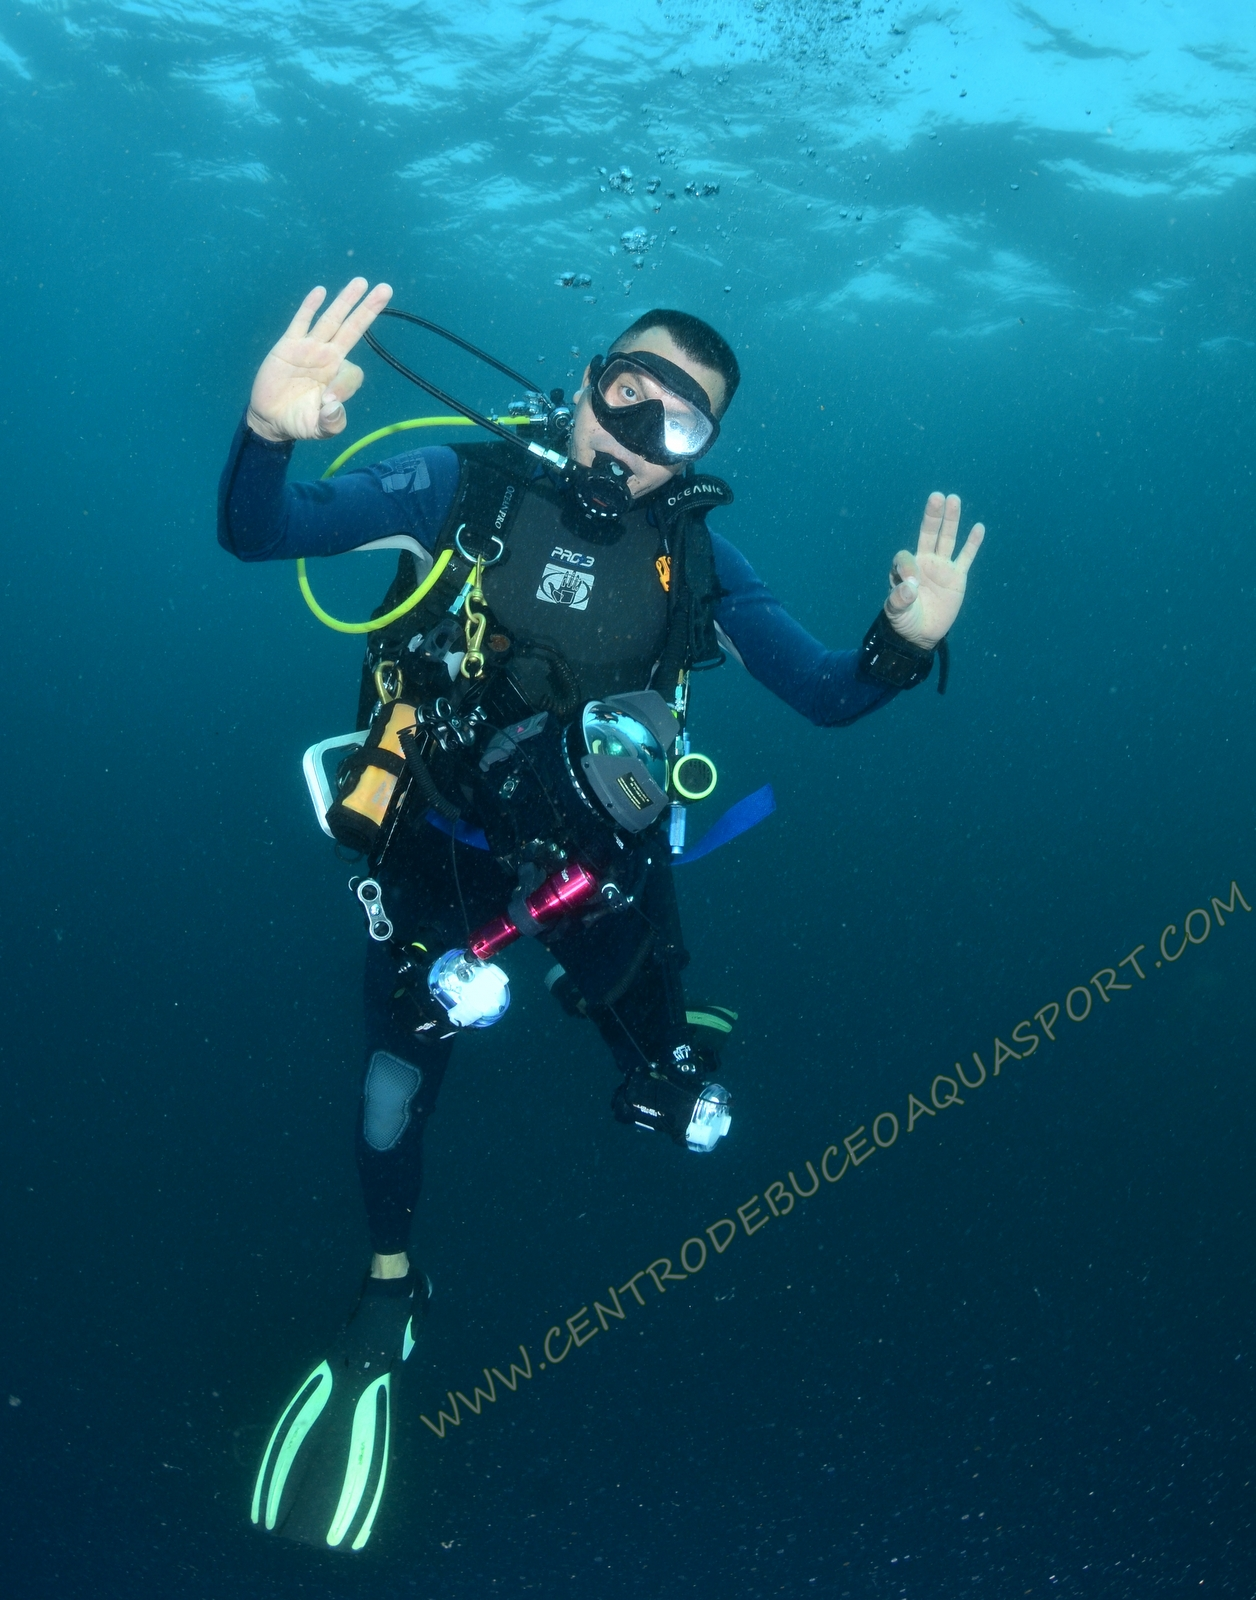 underwater-photography-aquasport-tayrona-scuba-diving